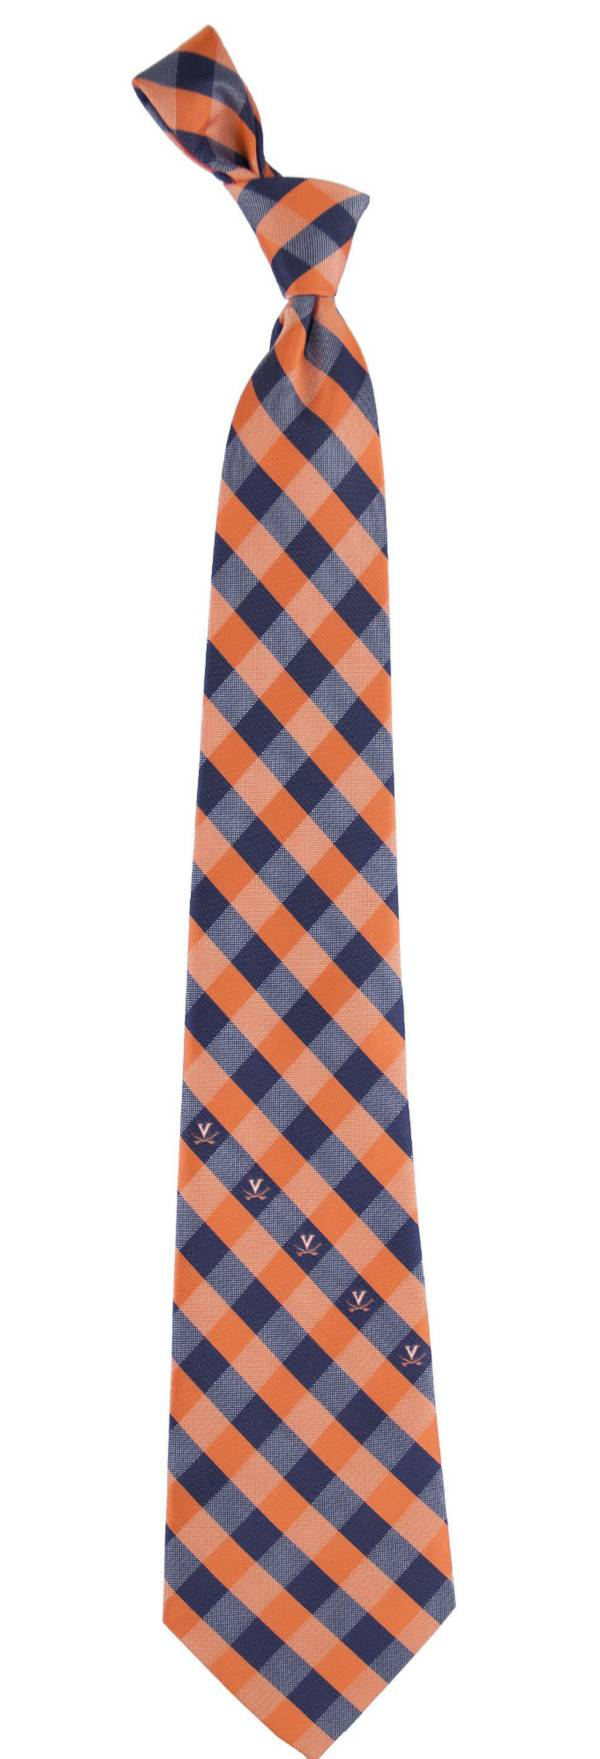 Eagles Wings Virginia Cavaliers Check Necktie product image